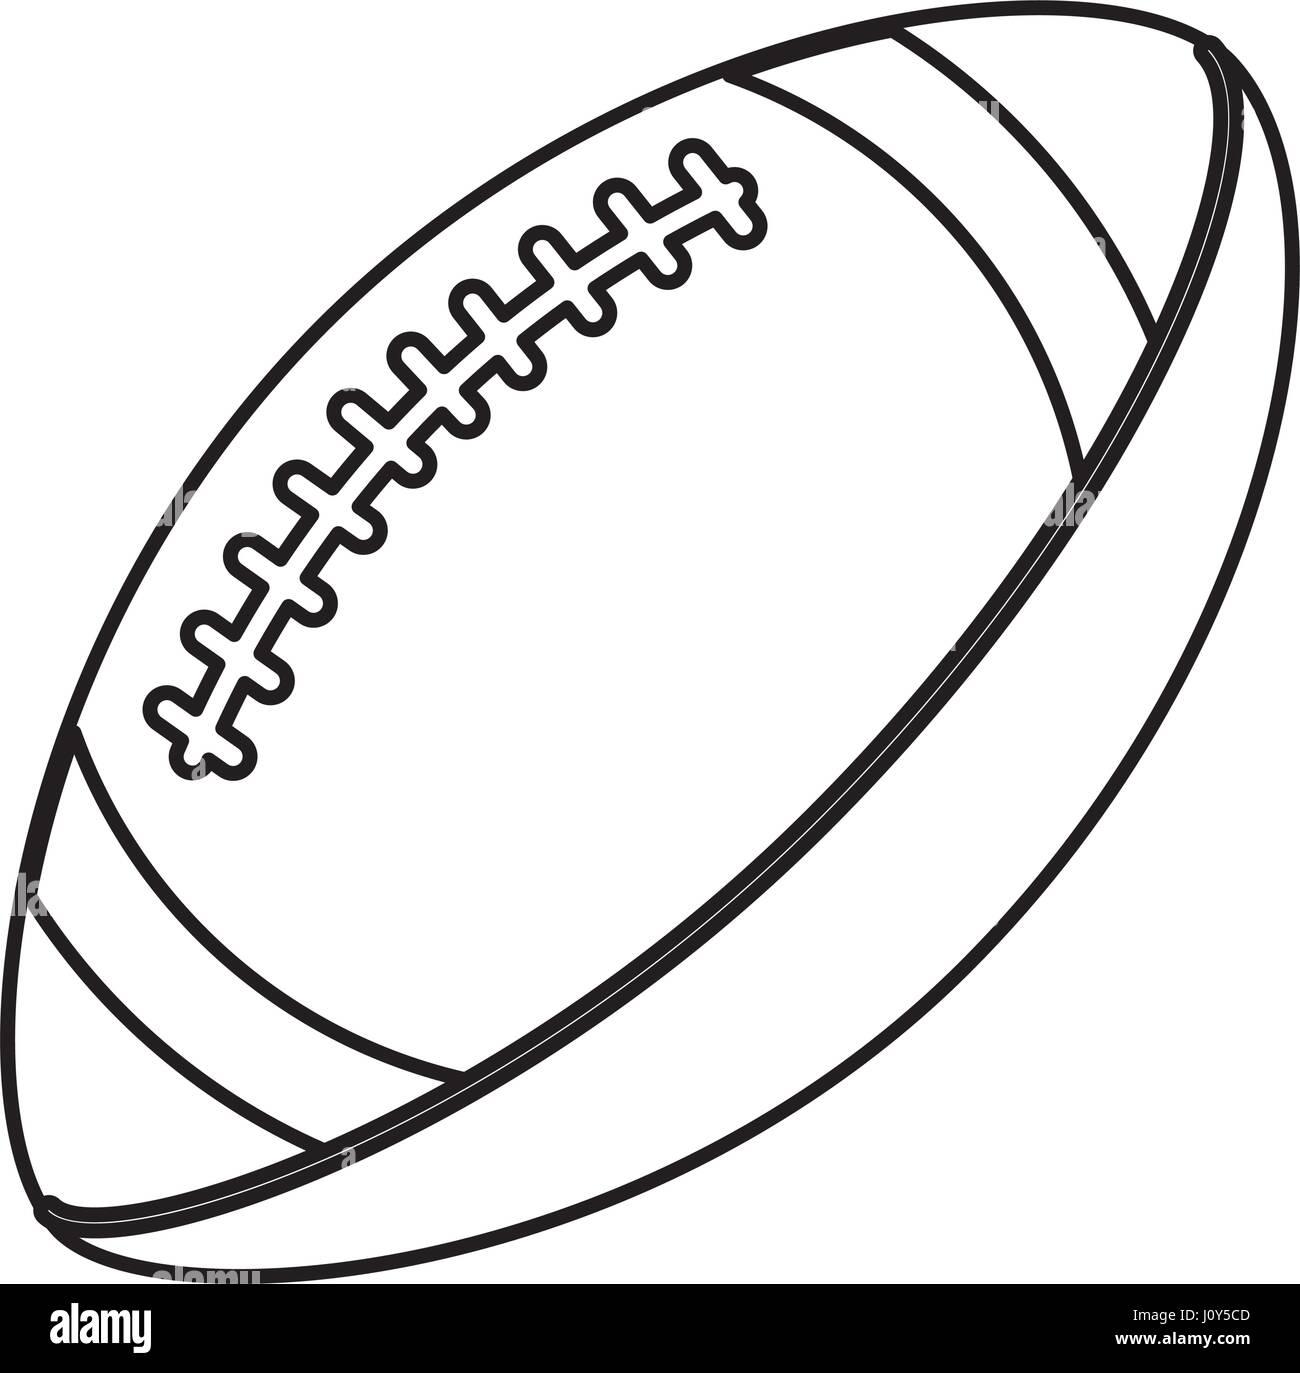 ball american football sport equipment outline - Football Outline